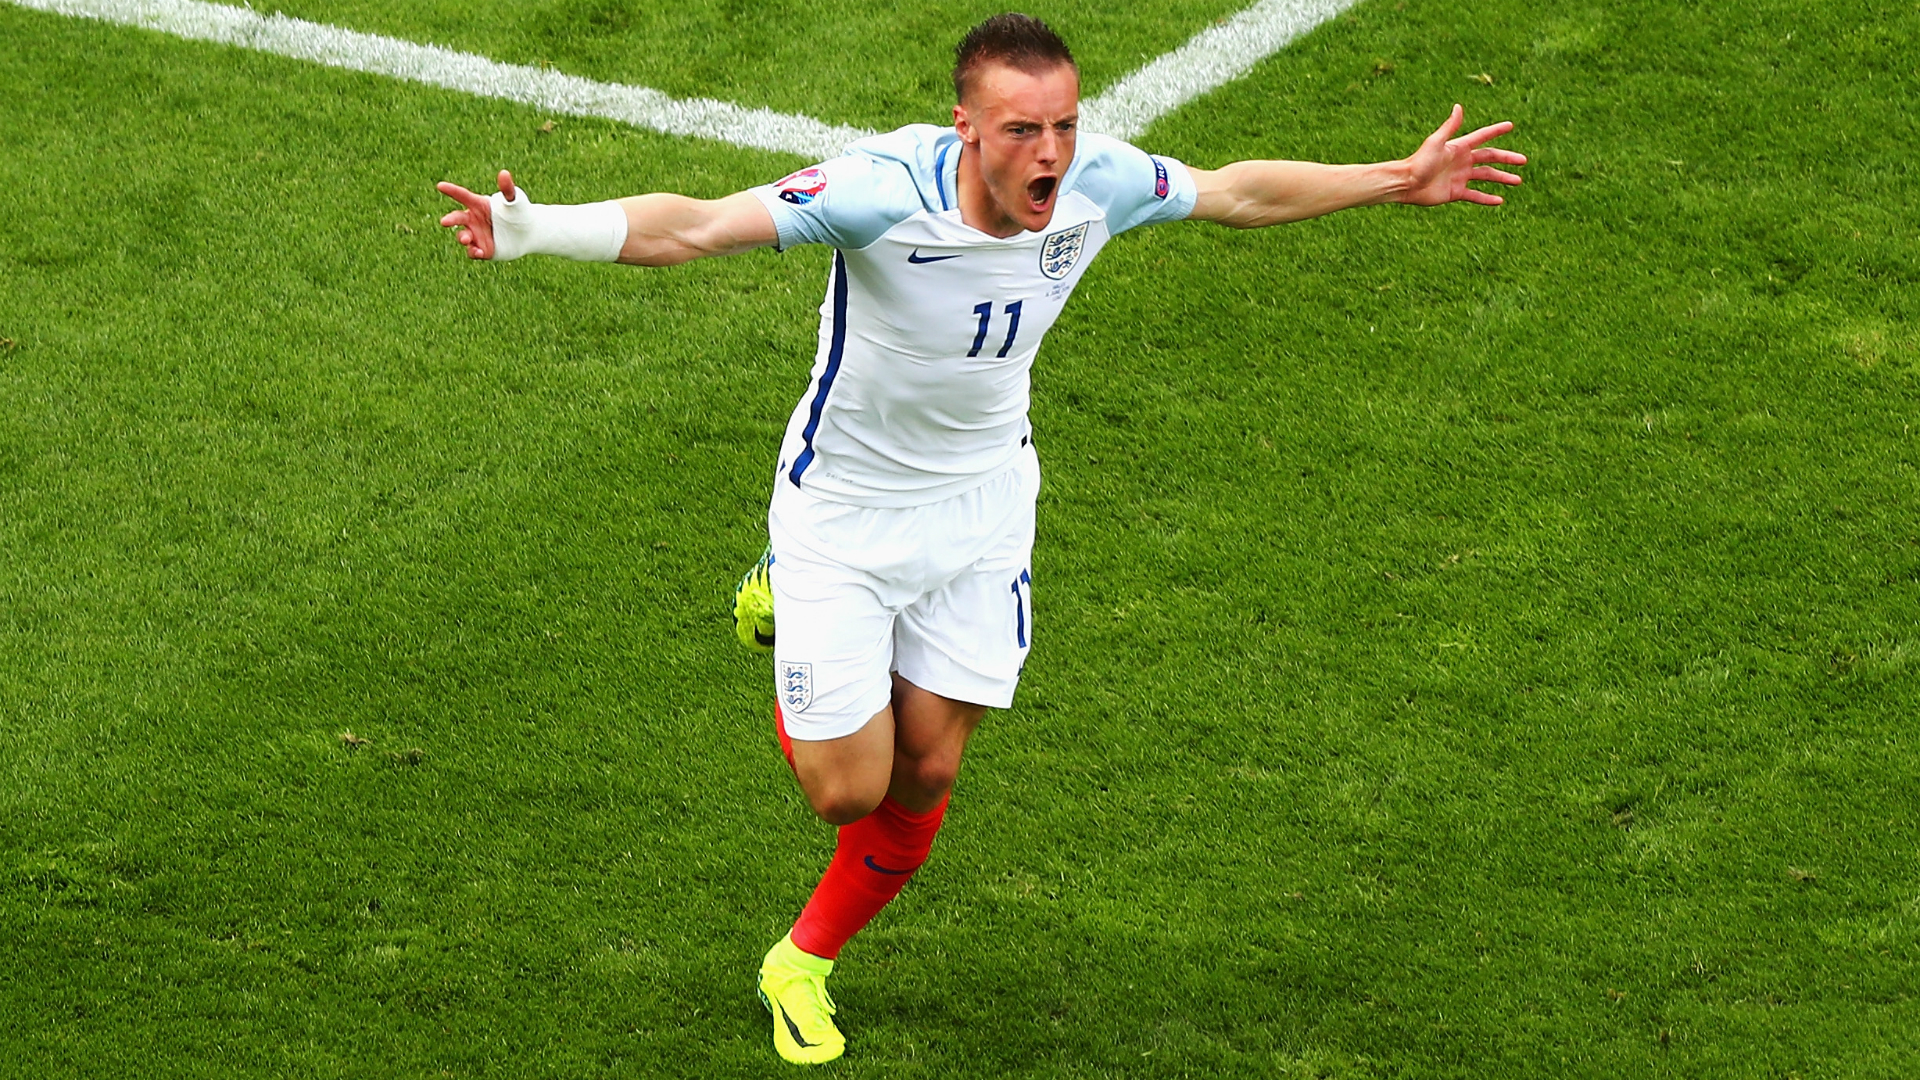 Euro 2016: England's Jamie Vardy eyes fairytale ending